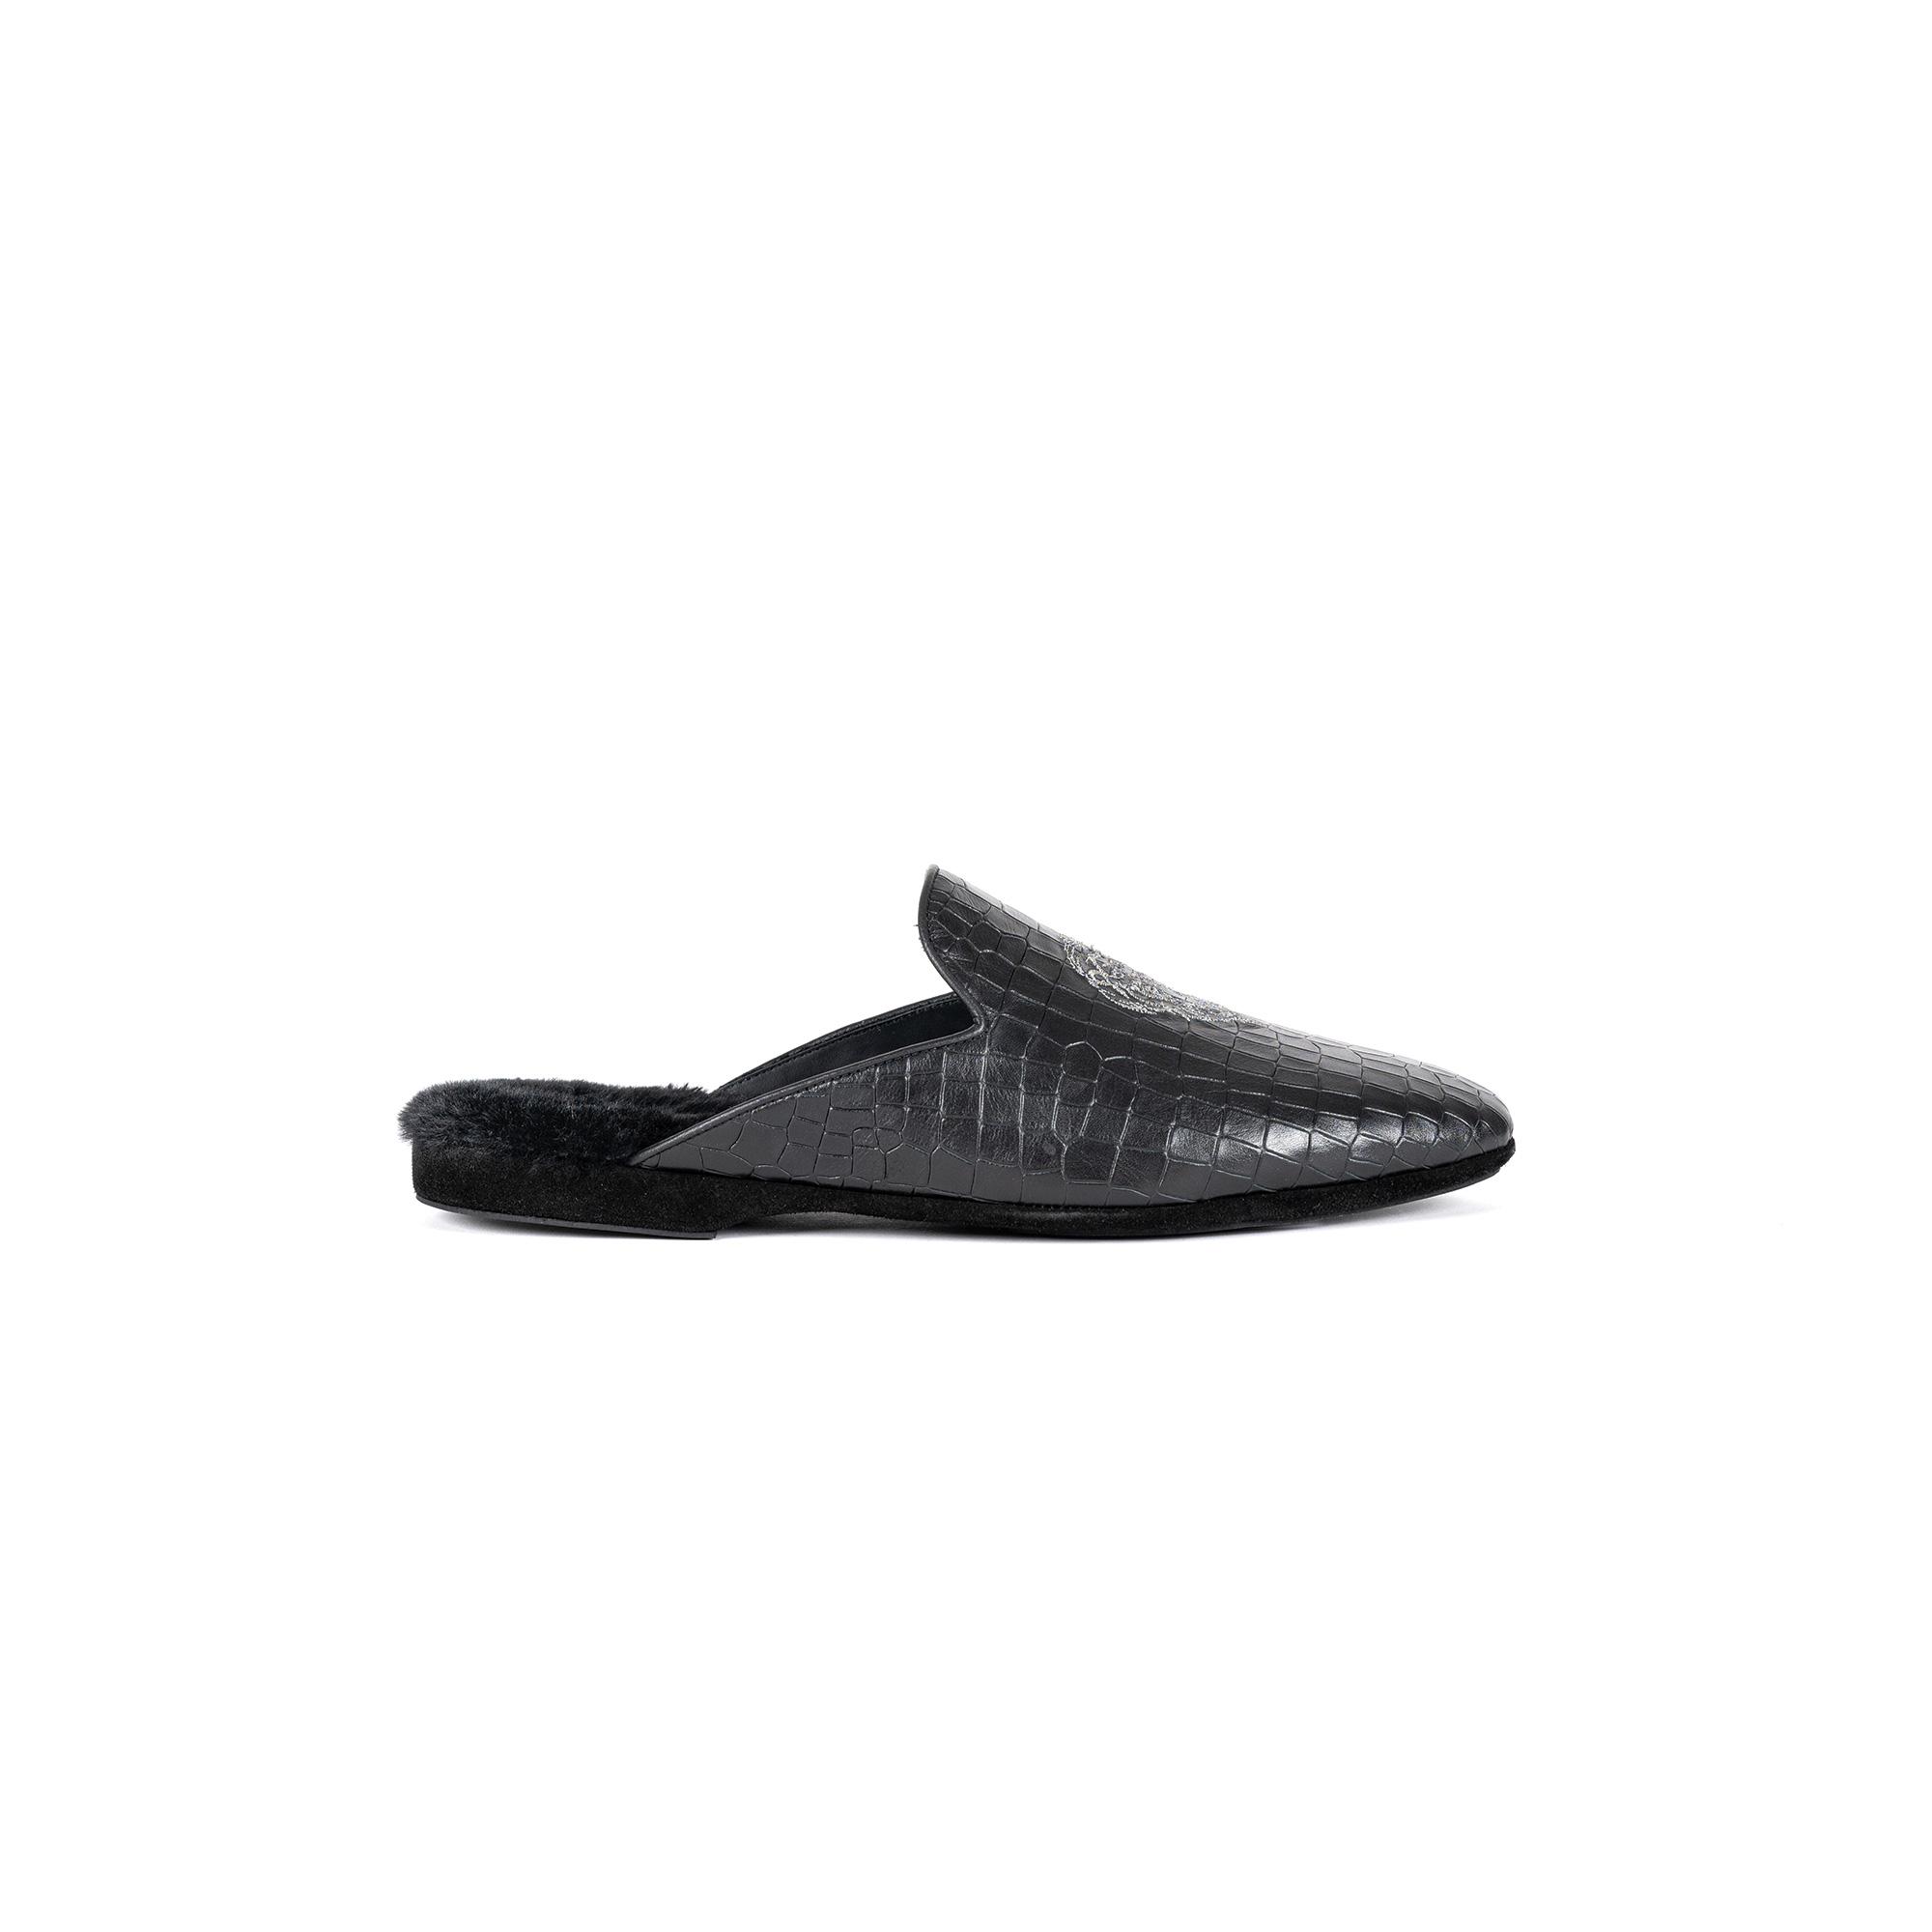 Indoor luxury slipper in black cocco print leather - Farfalla italian slippers